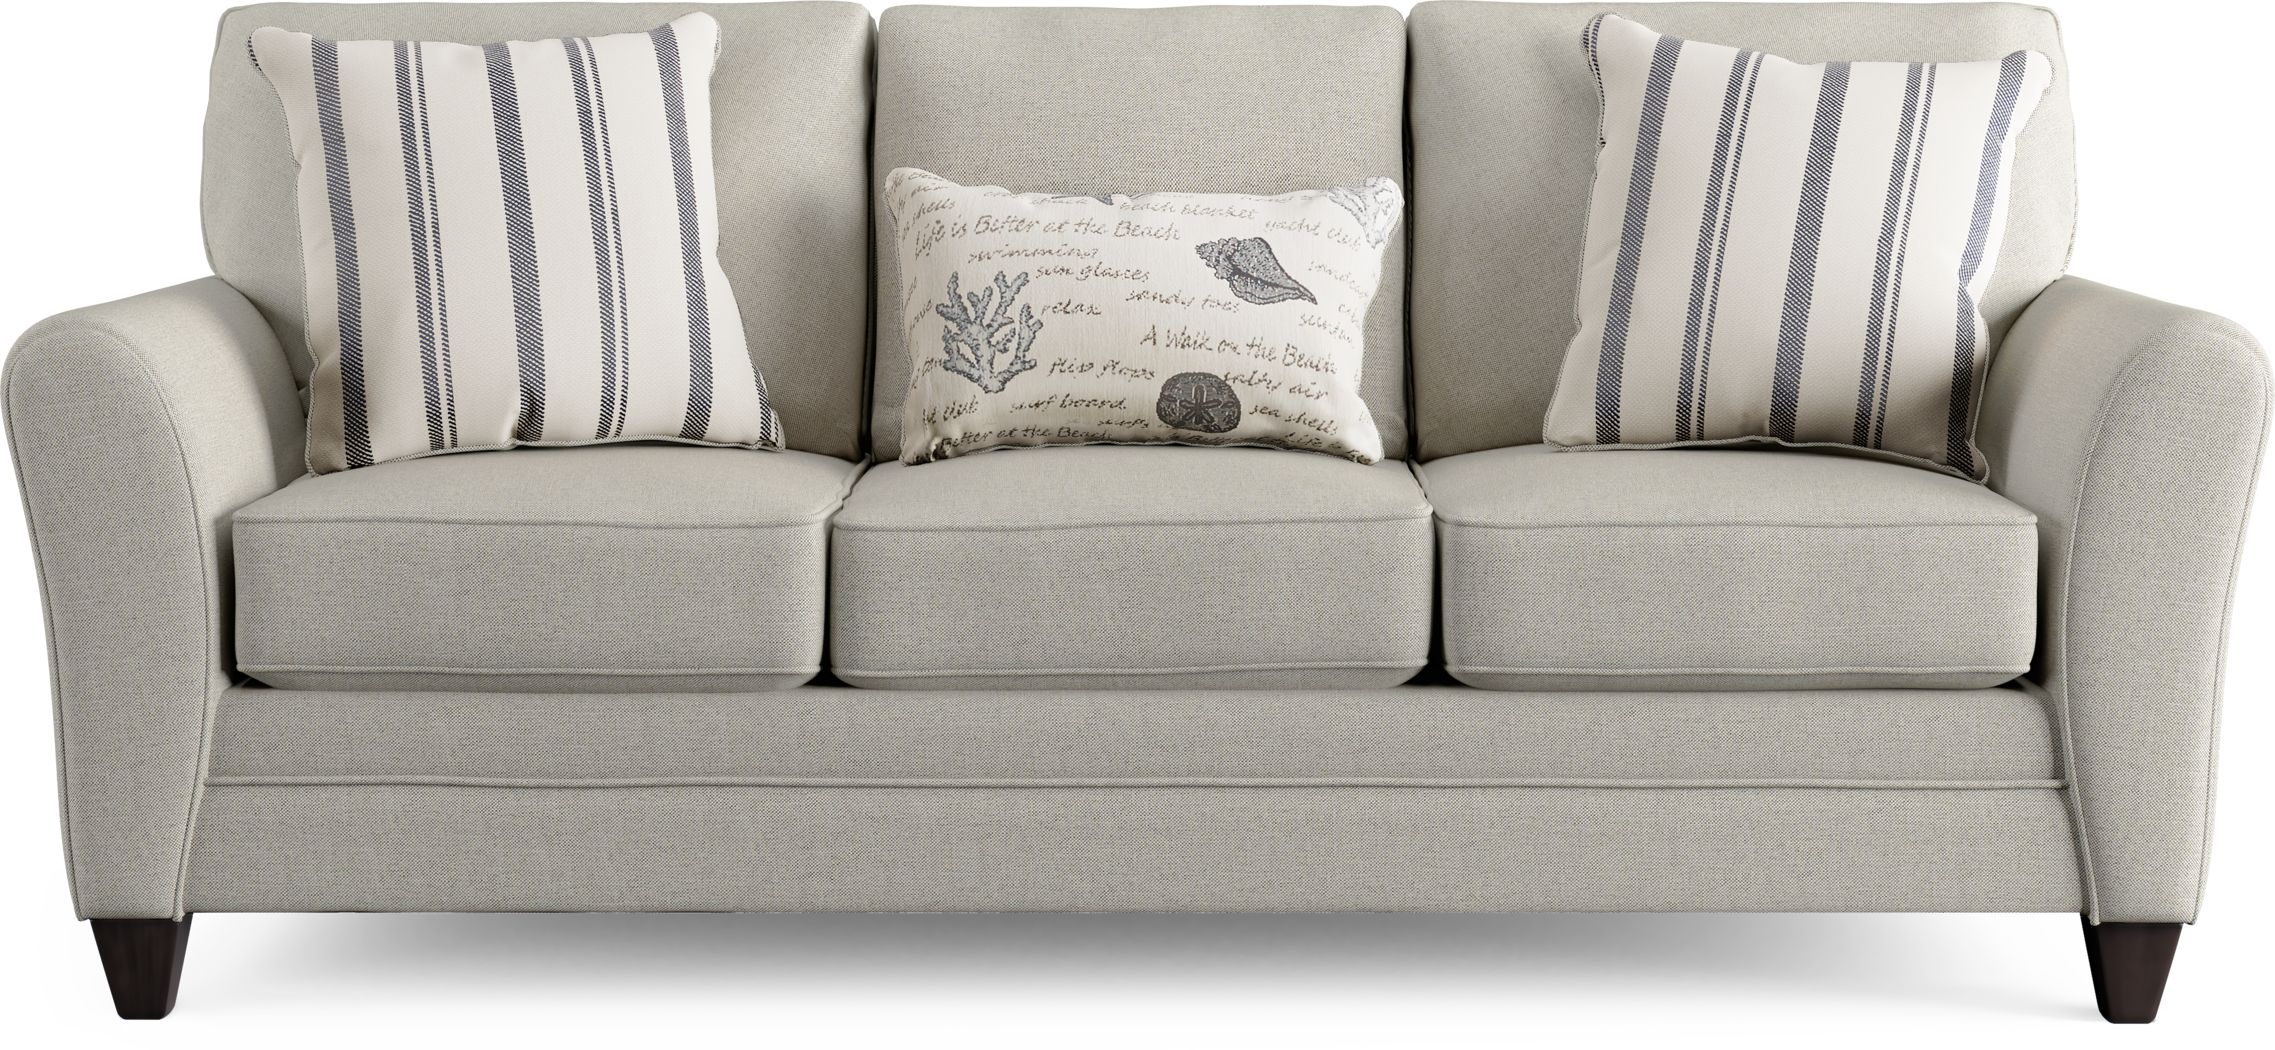 Beachfront Silver Sofa